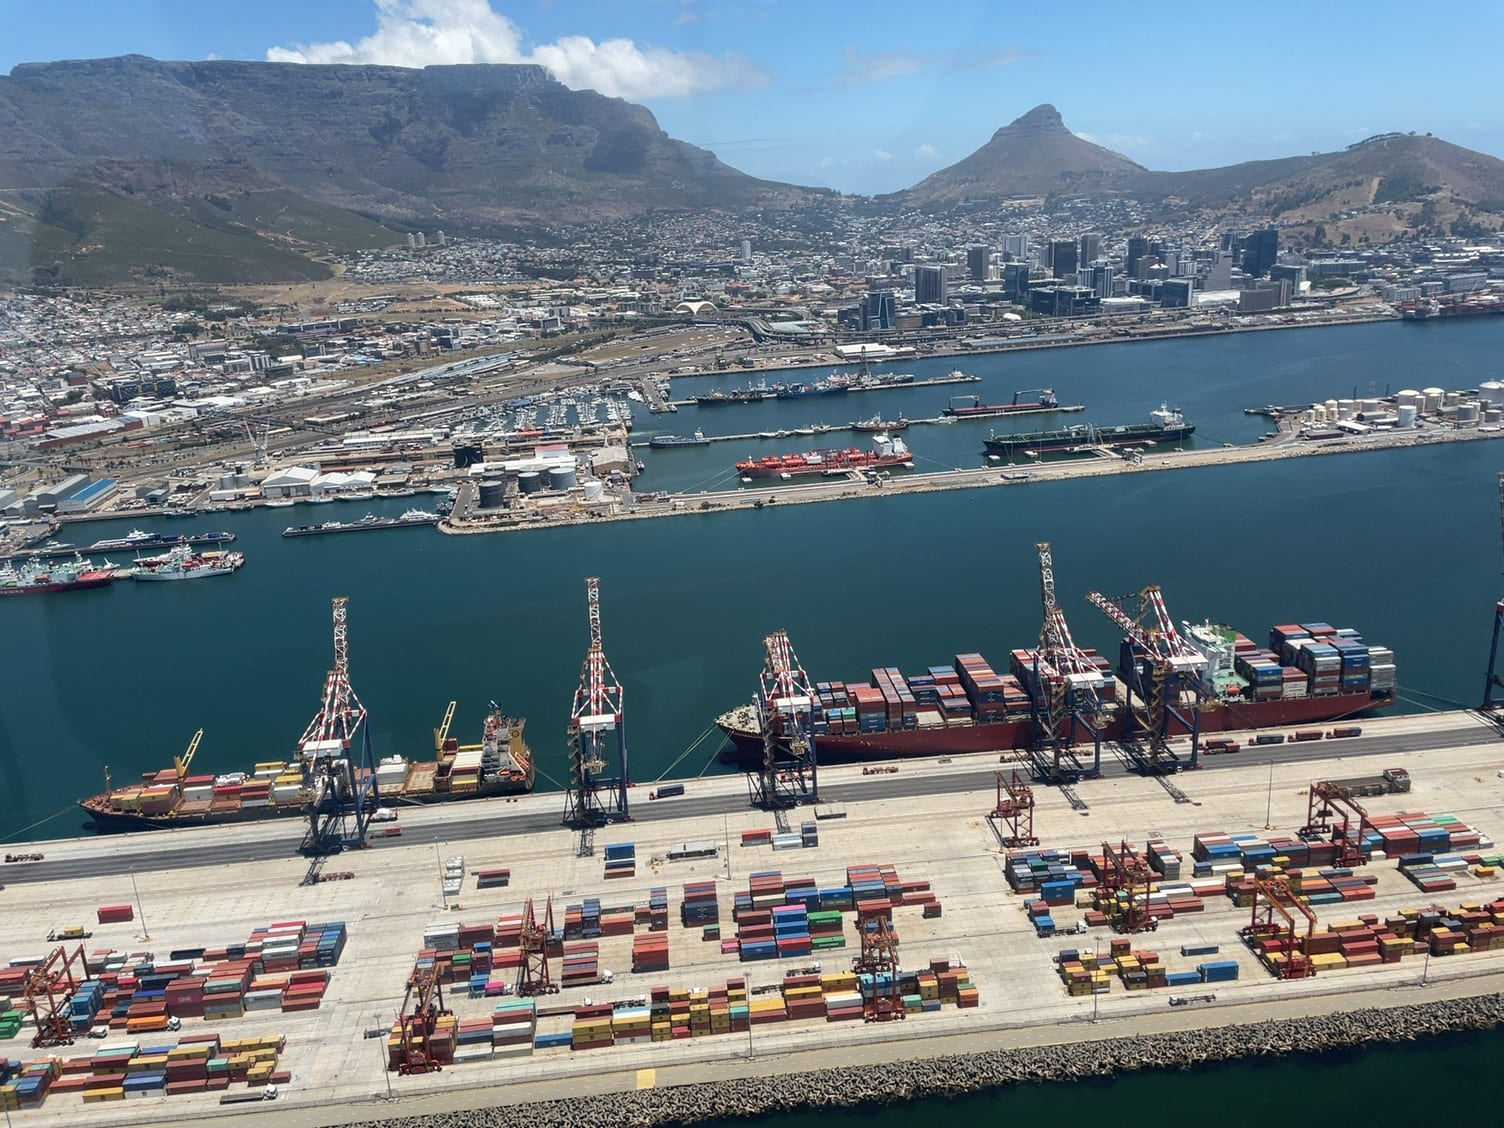 VineLiner Capetown